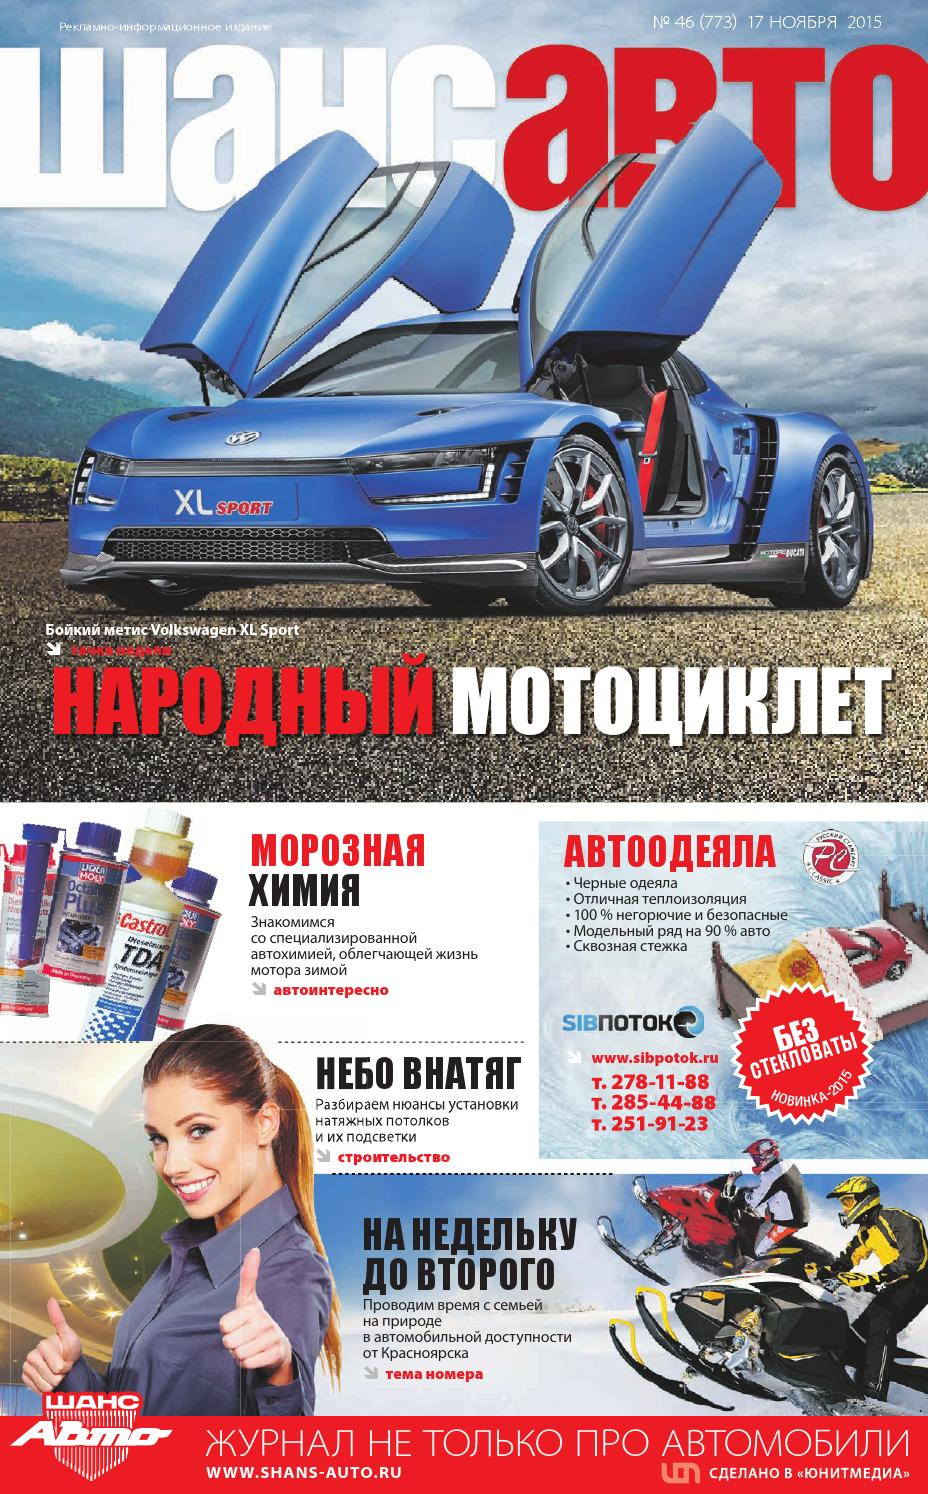 Shans auto 46 by shans-auto - issuu